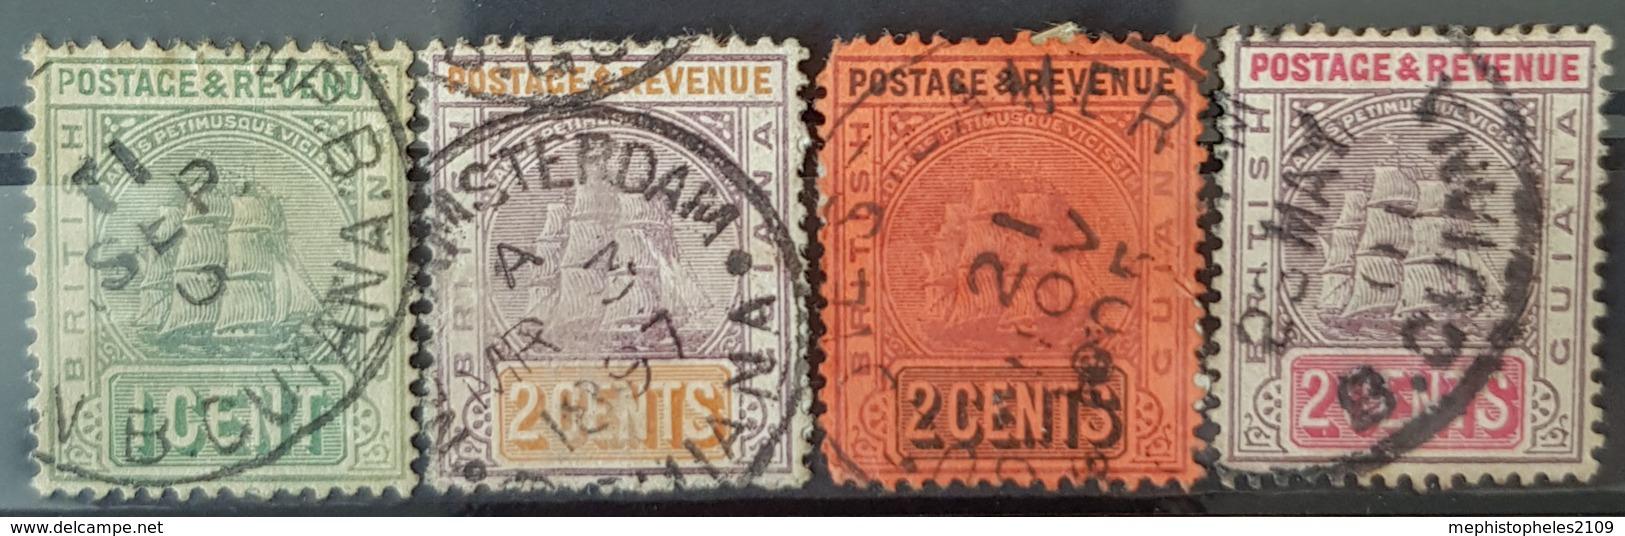 BRITISH GUIANA - Canceled - Sc# 131, 132, 133, 134, - British Guiana (...-1966)